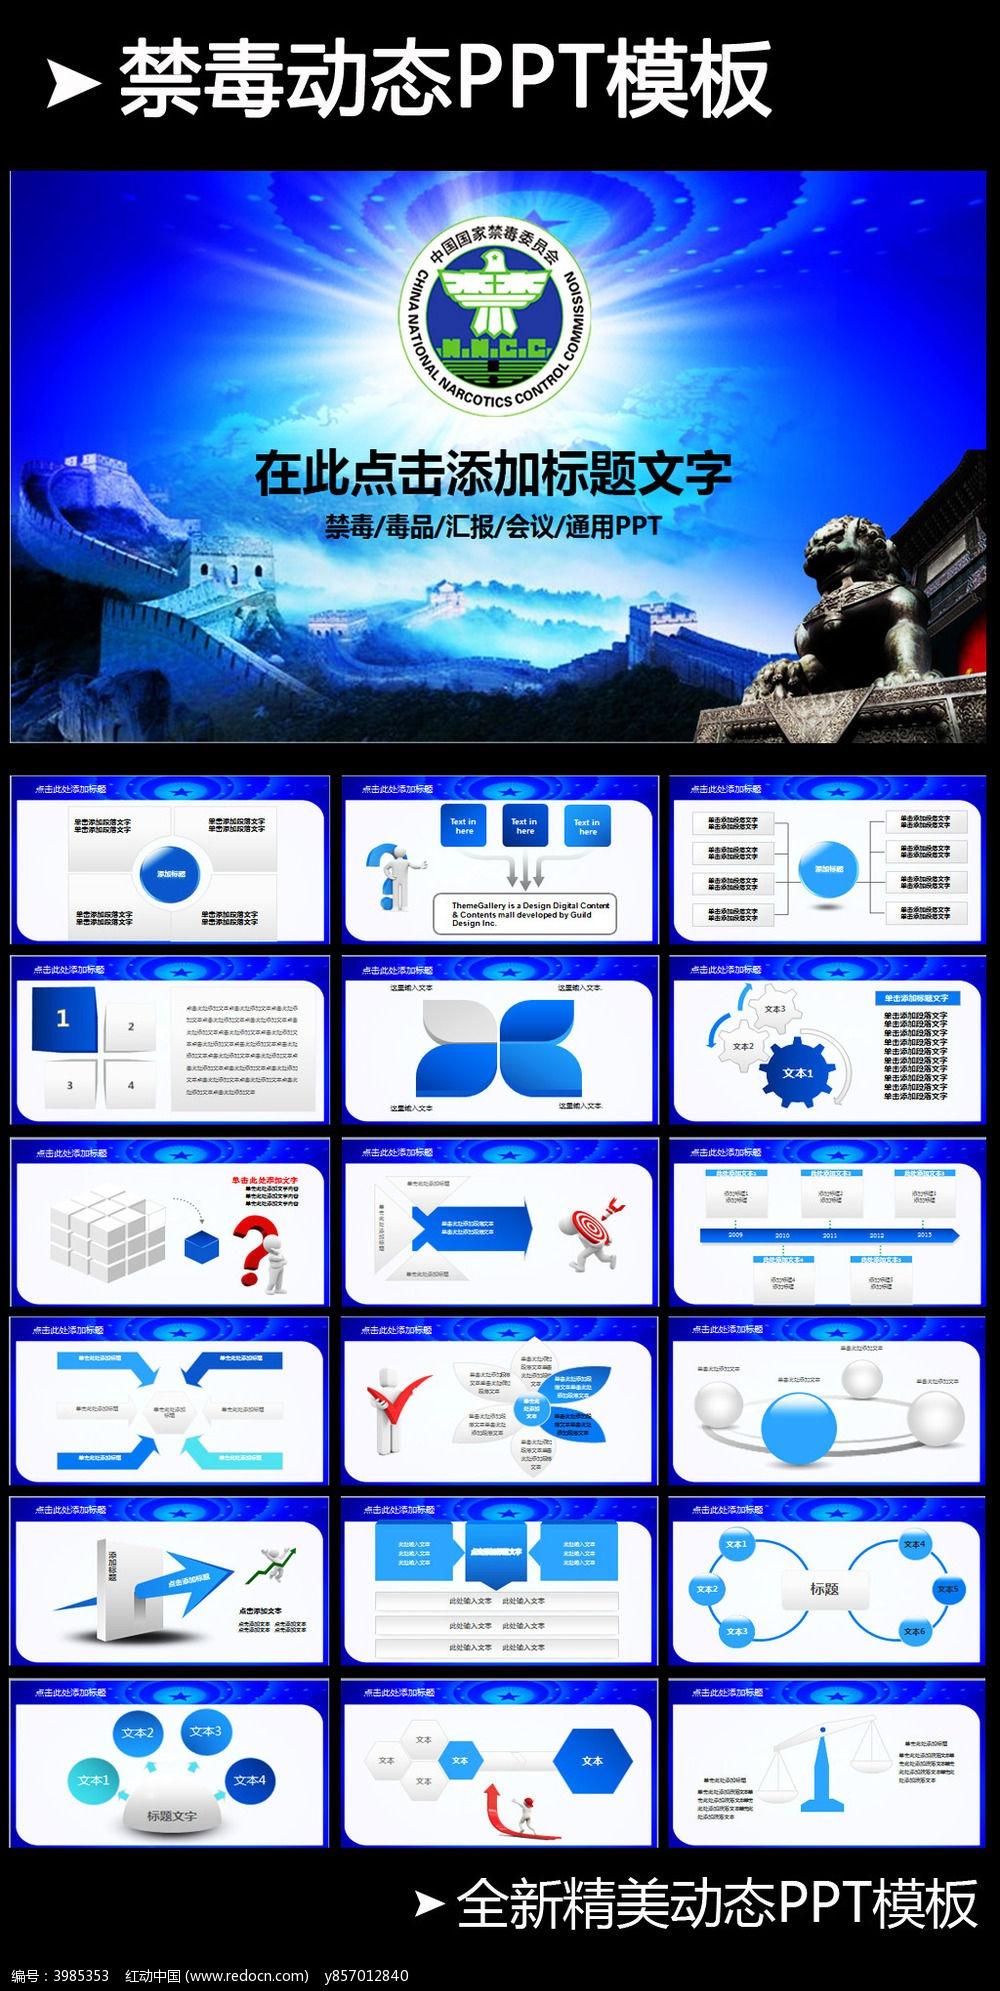 PPT模板 PPT图表 动态PPT 会议 报告 座谈 交流 表彰 工作 总结 计划